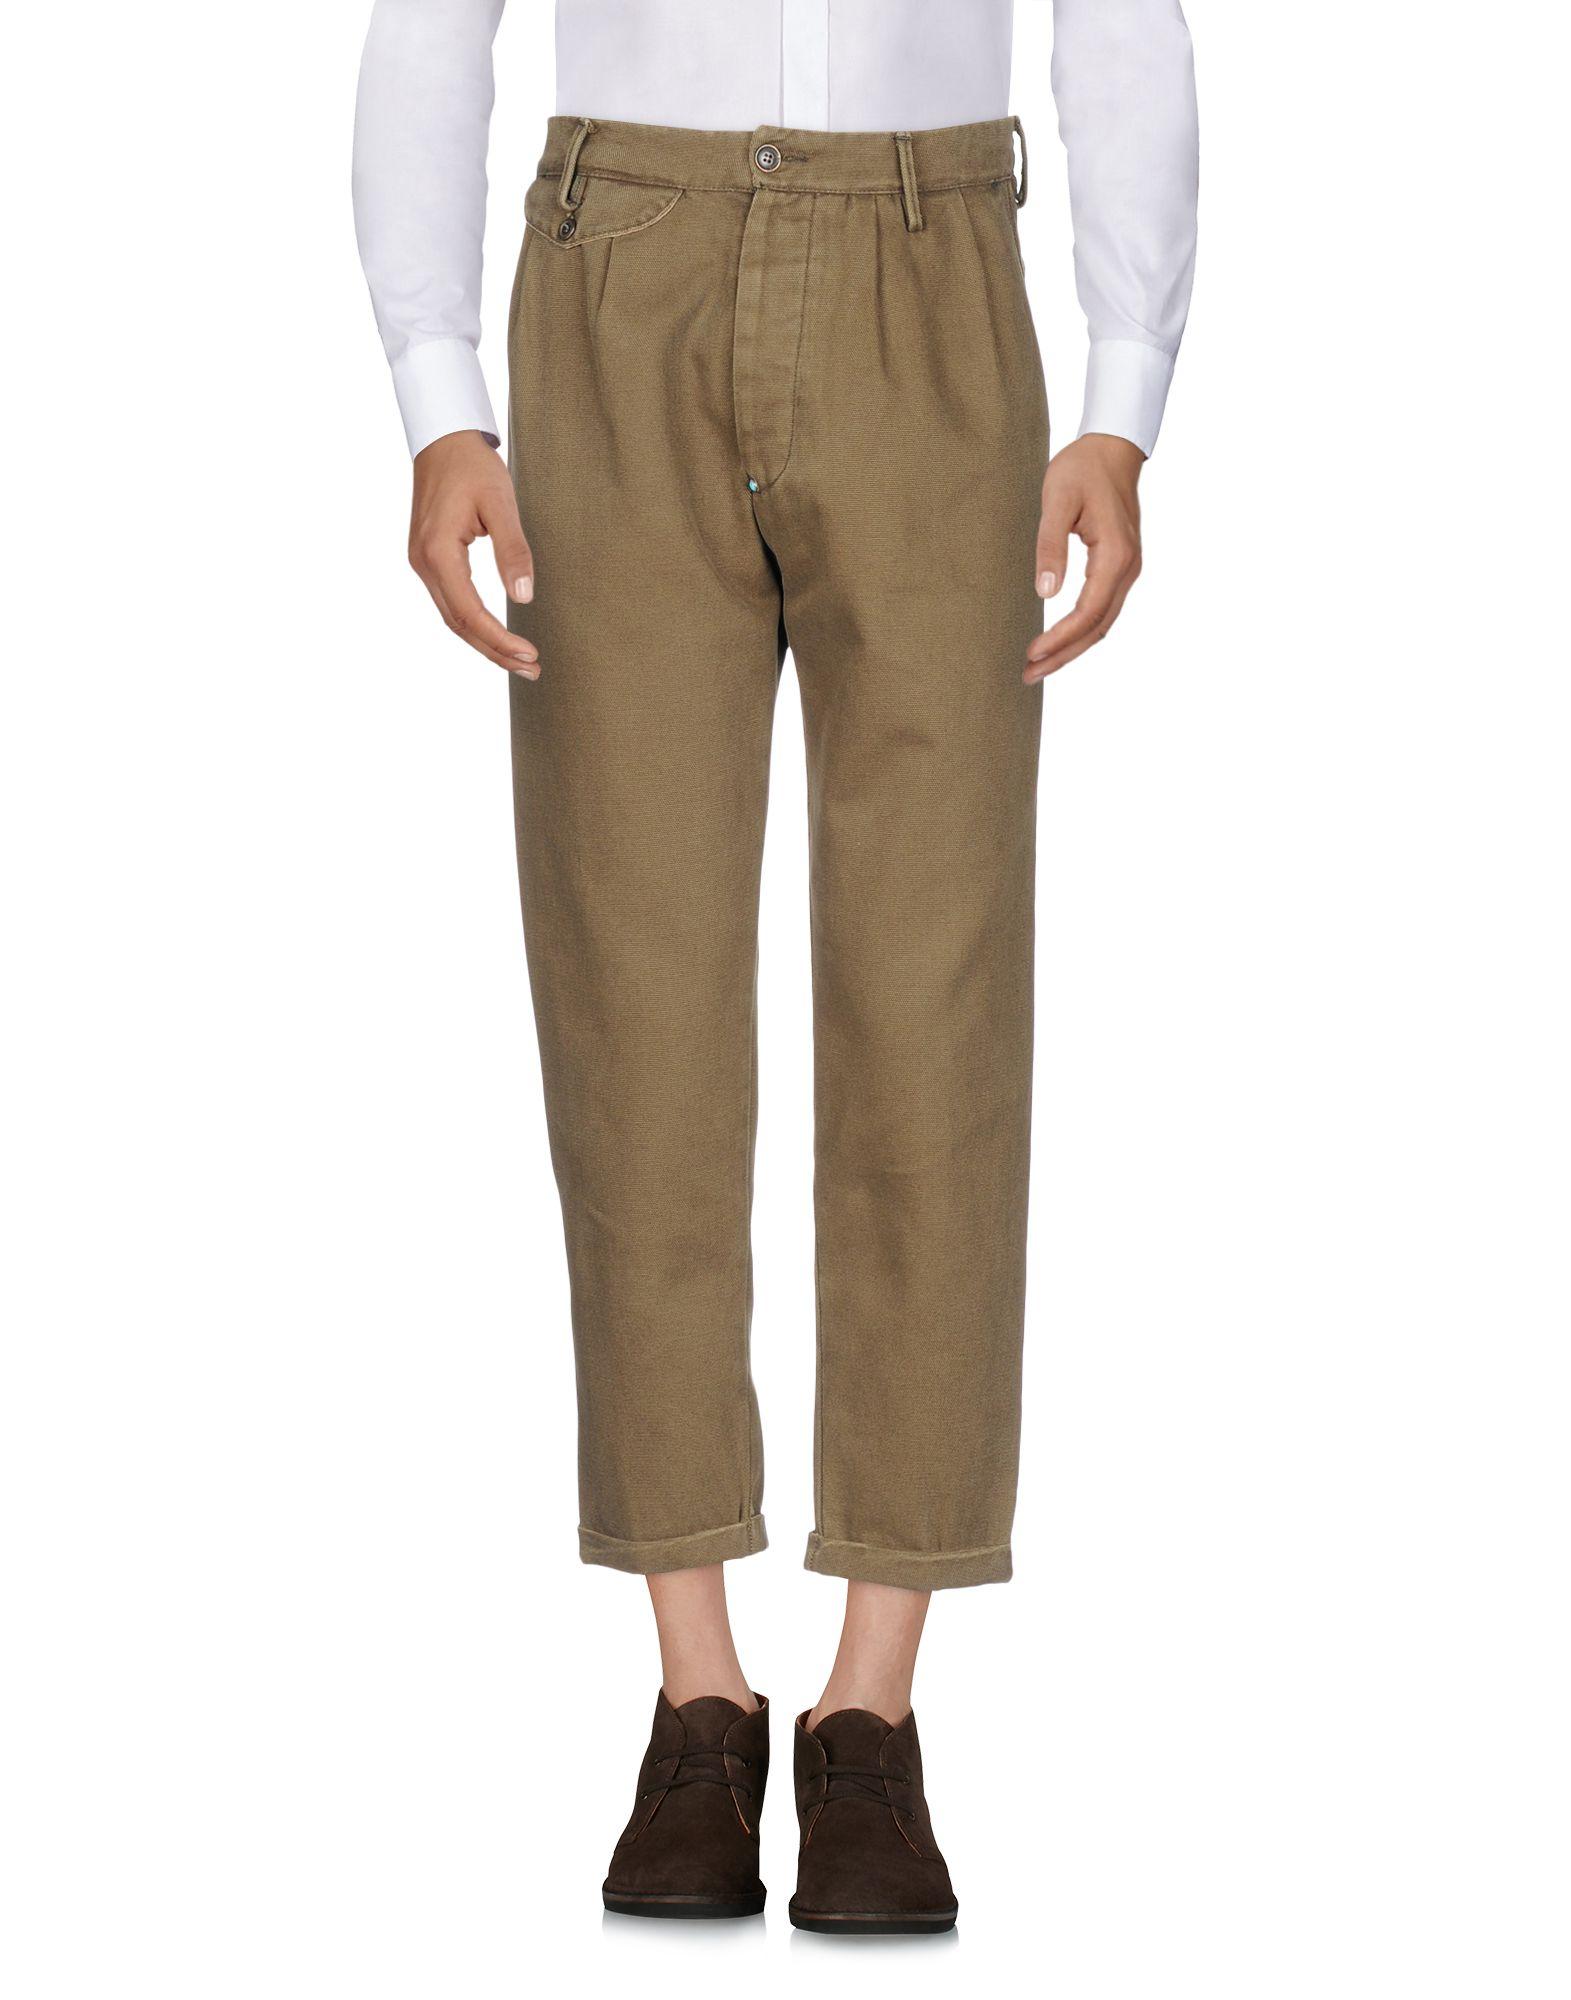 WHITE SAND 88 Повседневные брюки won hundred повседневные брюки